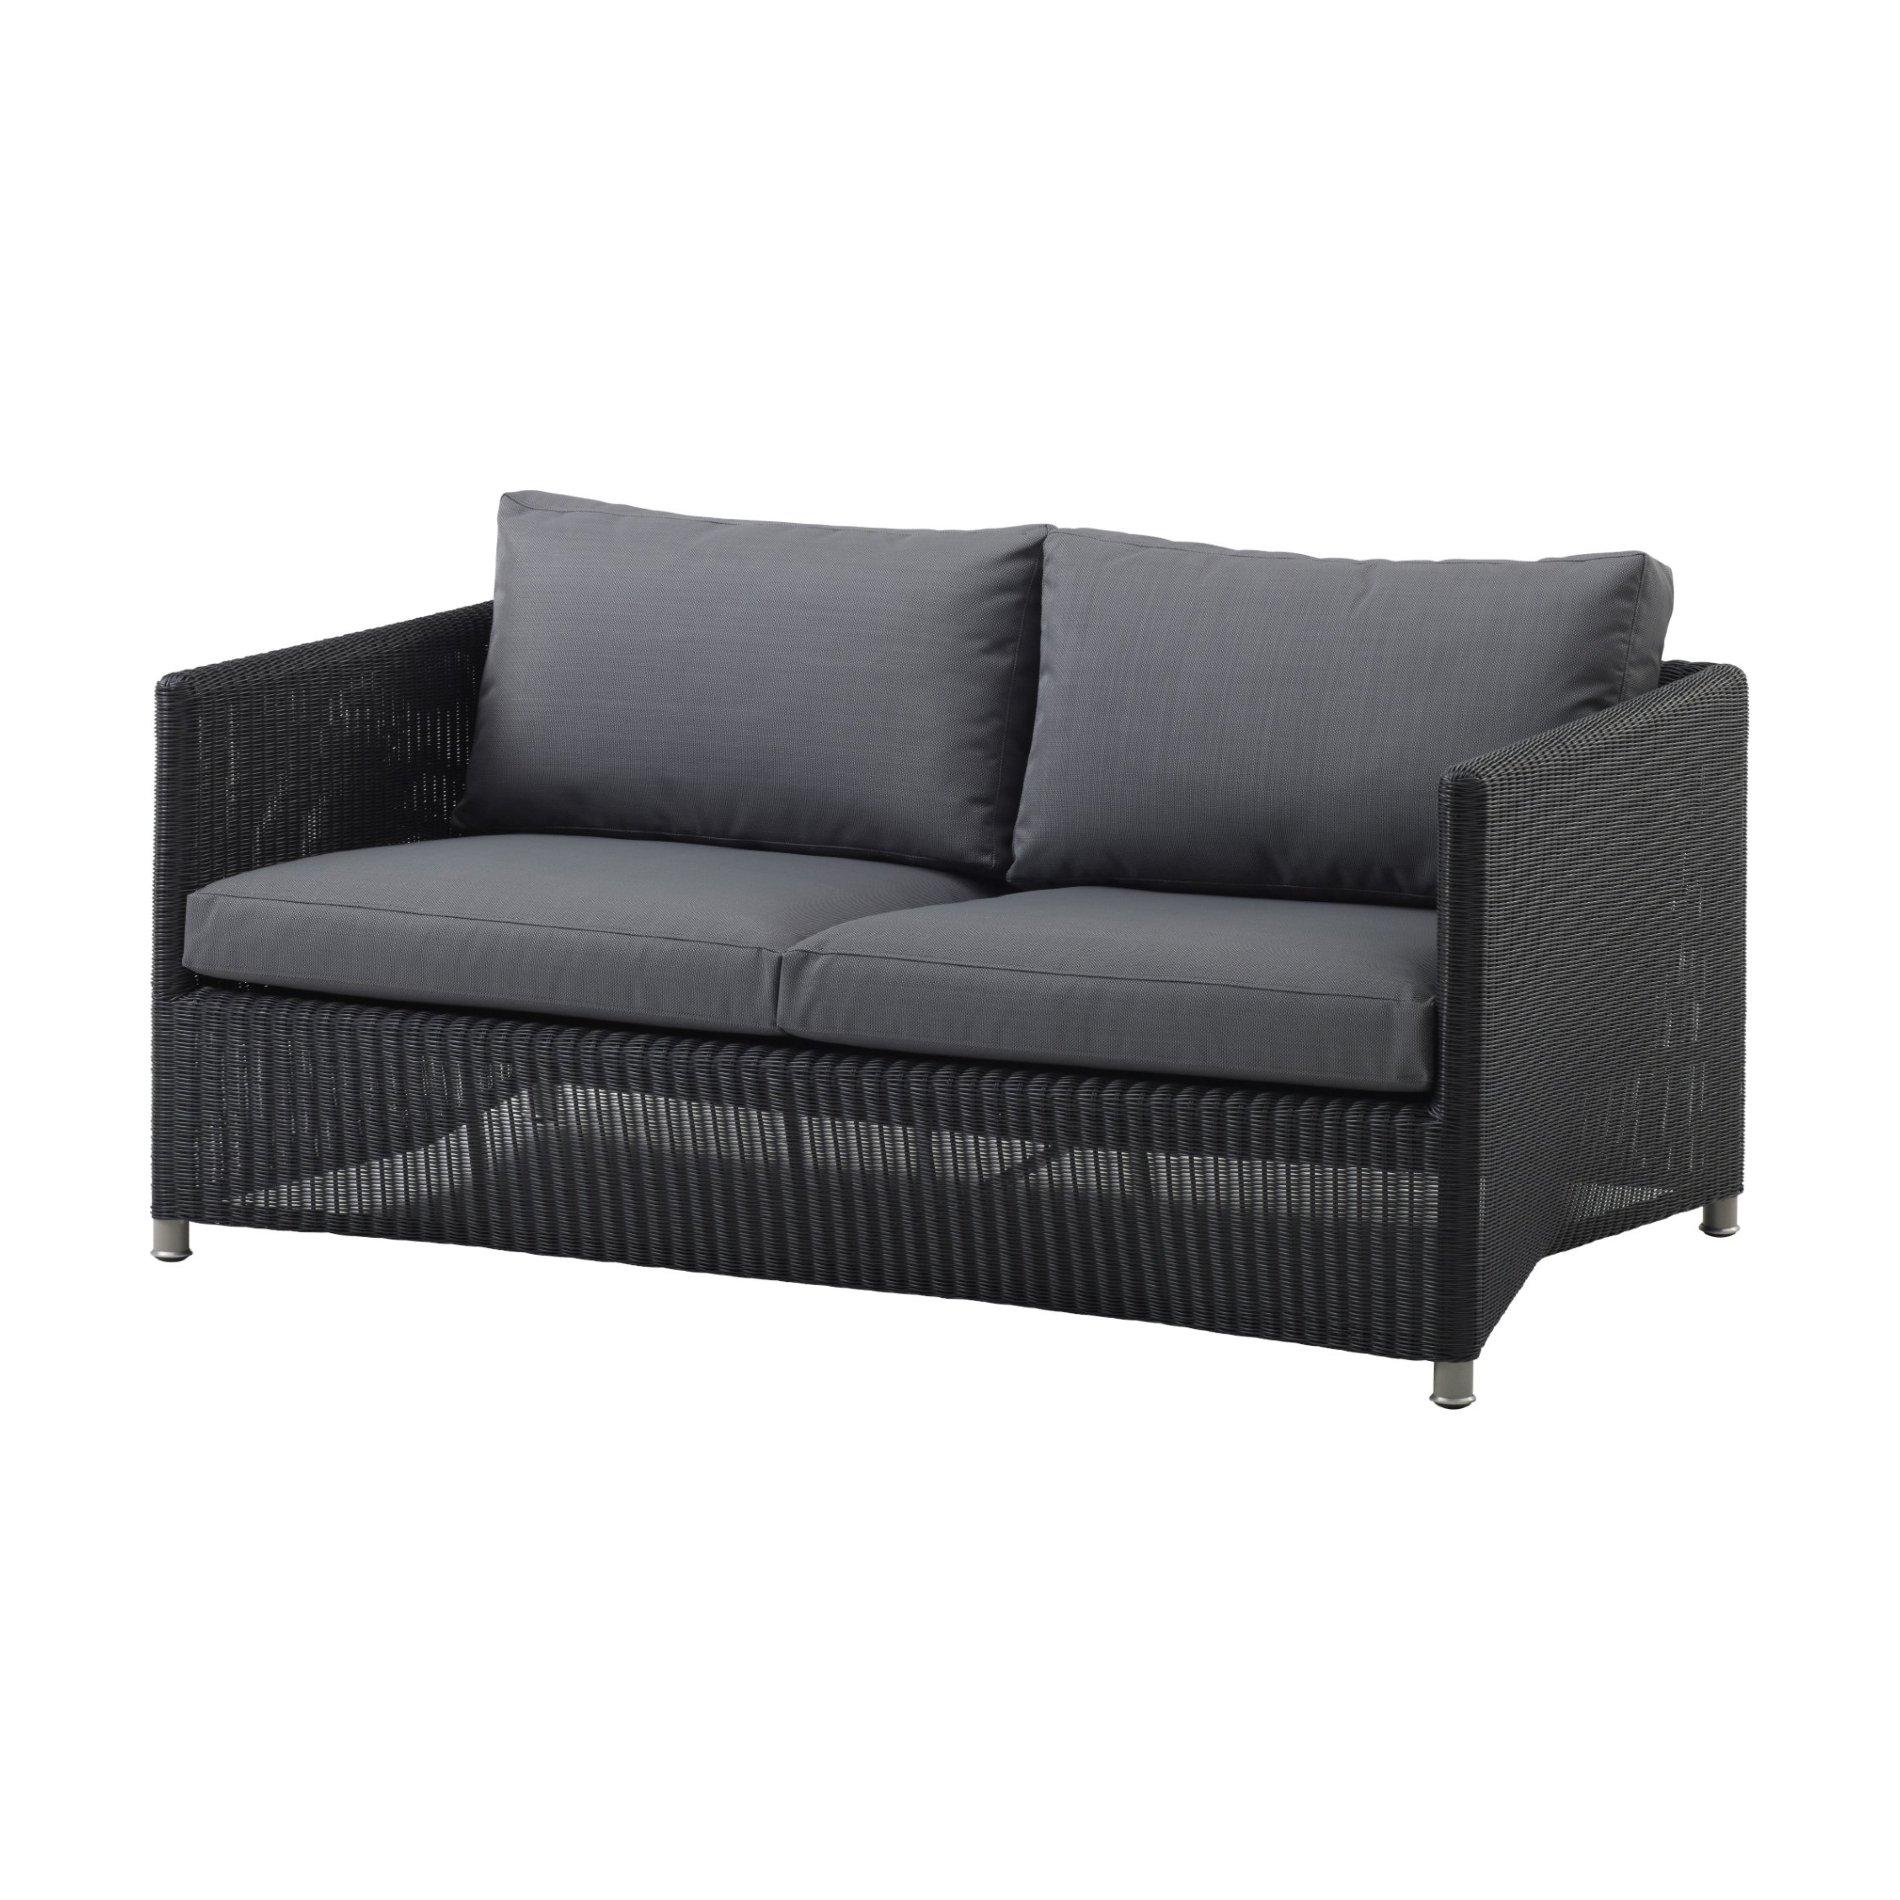 cane line loungesofa diamond aus geflecht jetzt. Black Bedroom Furniture Sets. Home Design Ideas